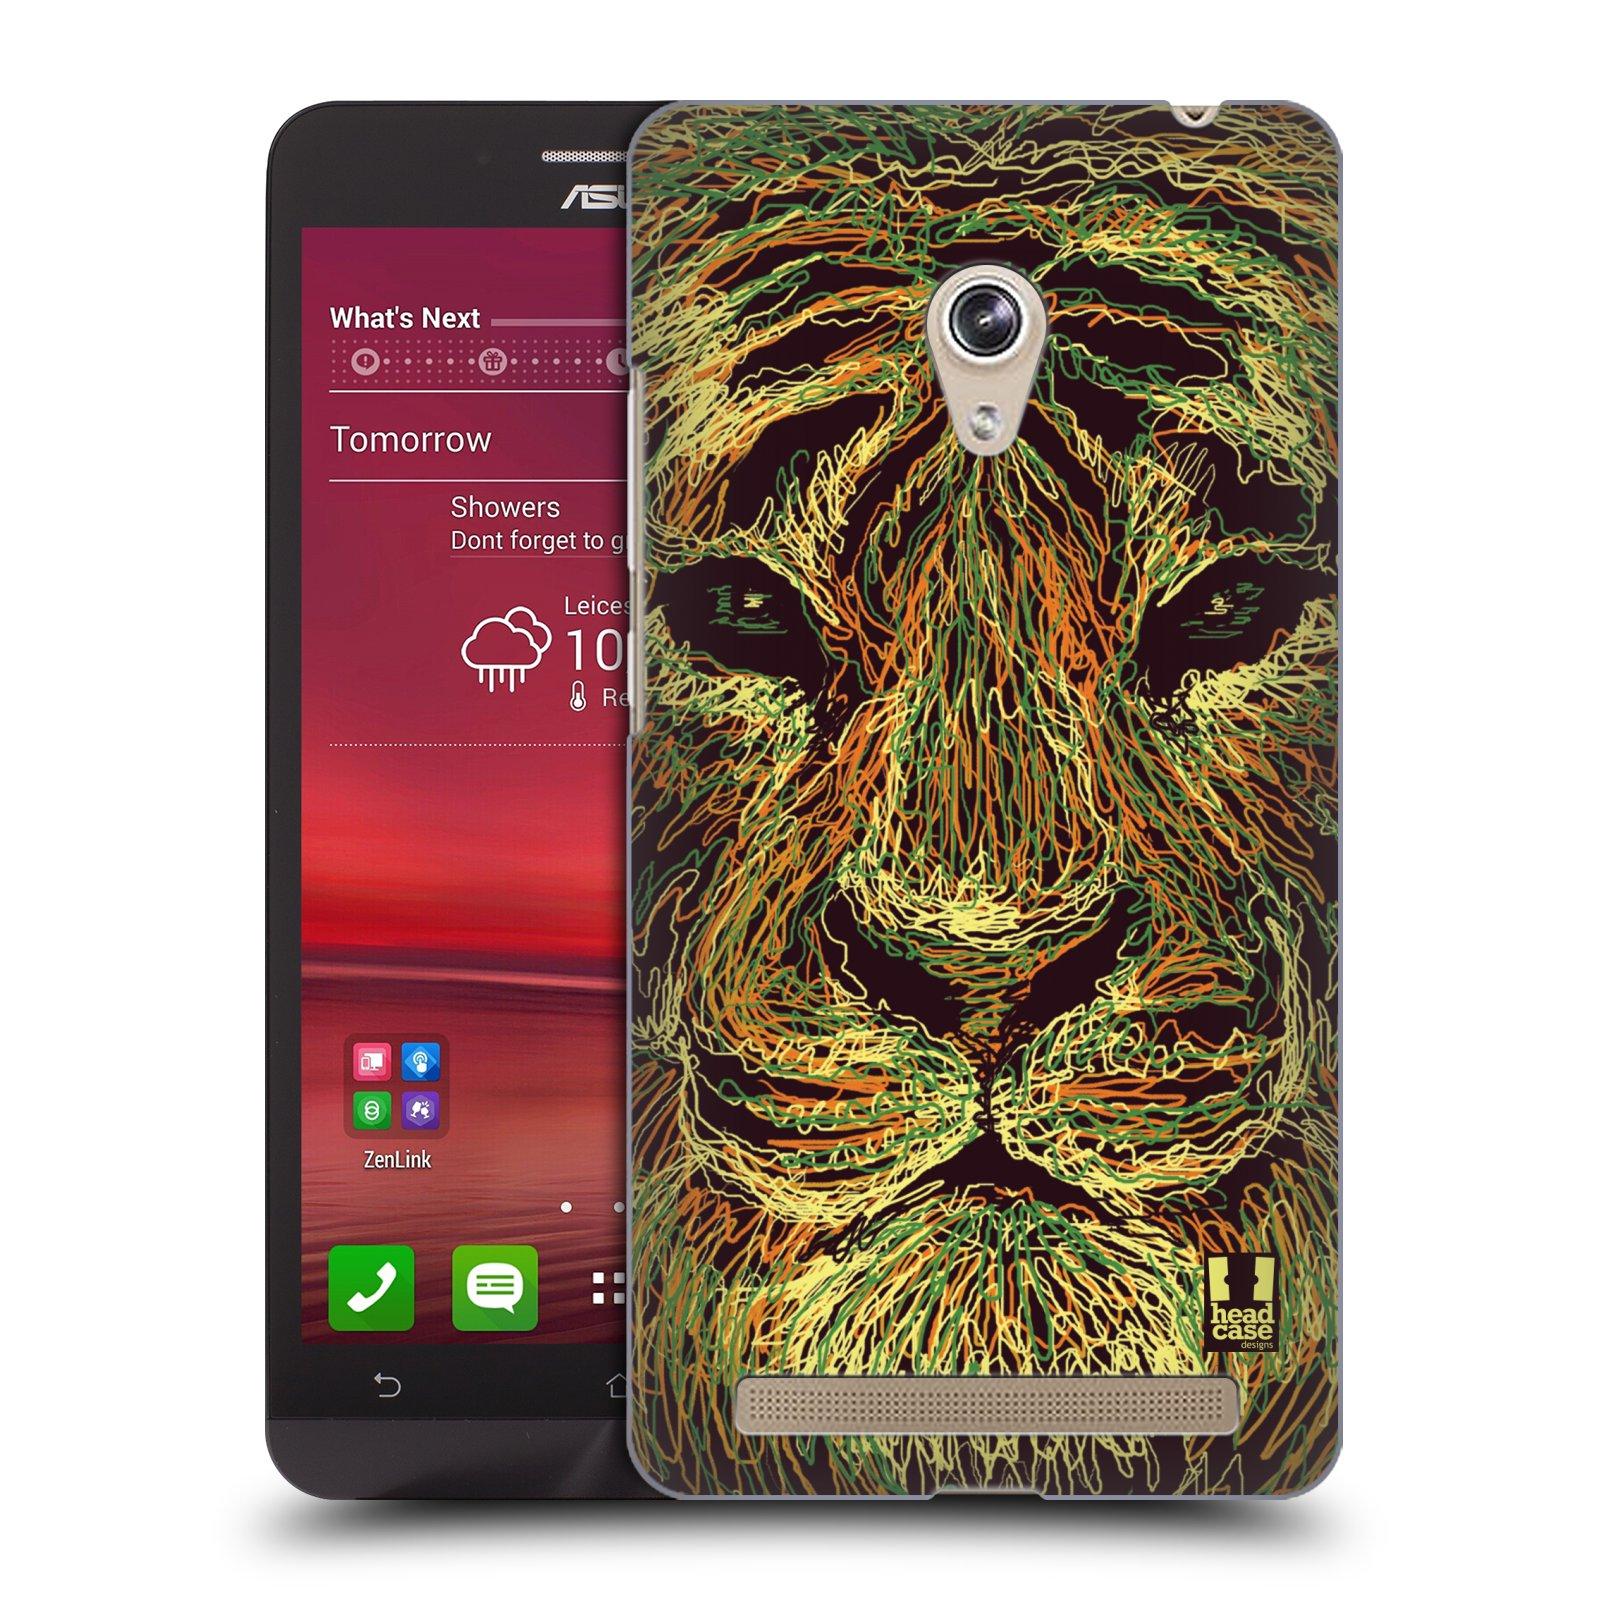 HEAD CASE plastový obal na mobil Asus Zenfone 6 vzor zvíře čmáranice tygr